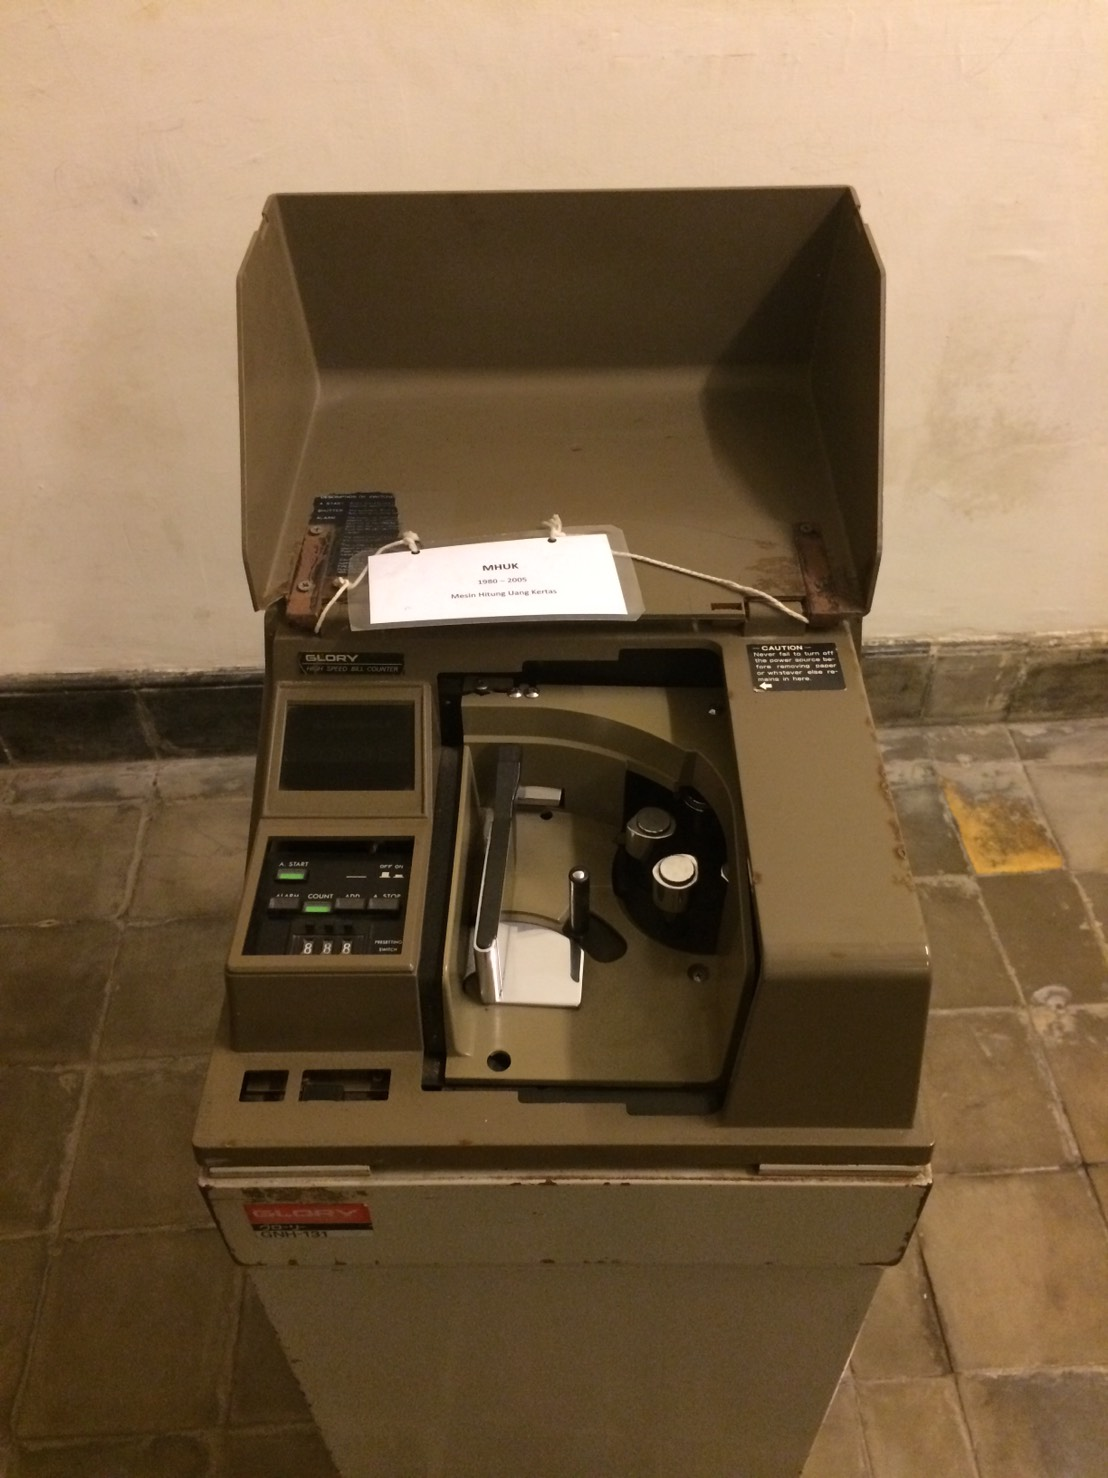 mesin hitung uang kertas l Sumber: Atika puji